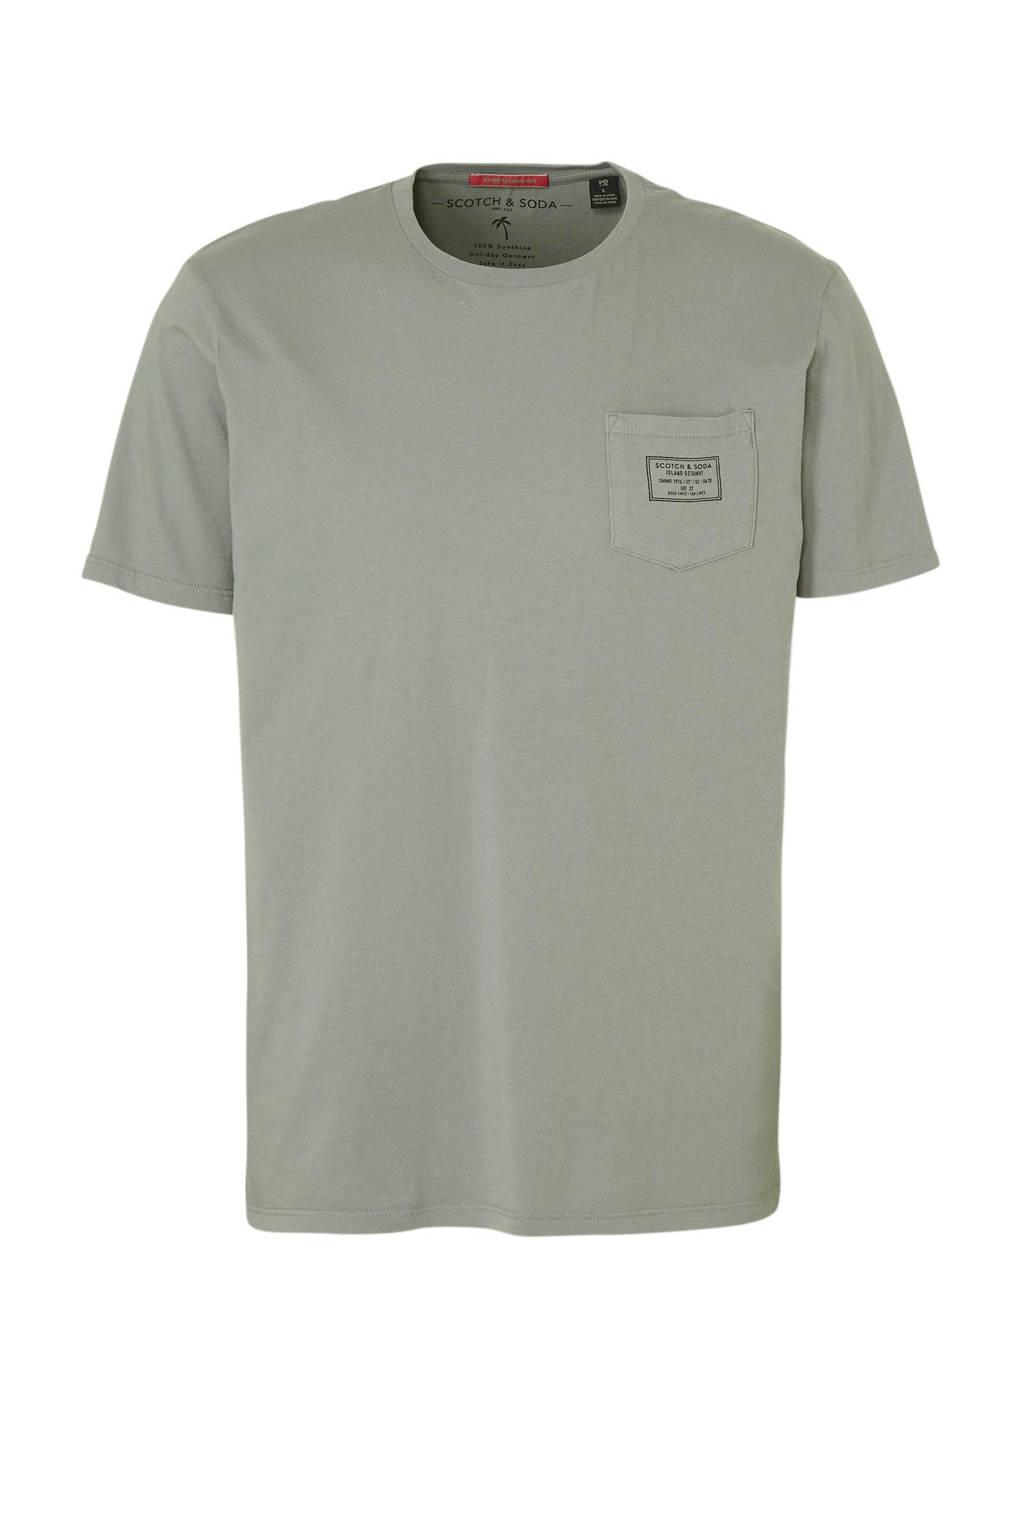 Scotch & Soda T-shirt, Lichtgrijs